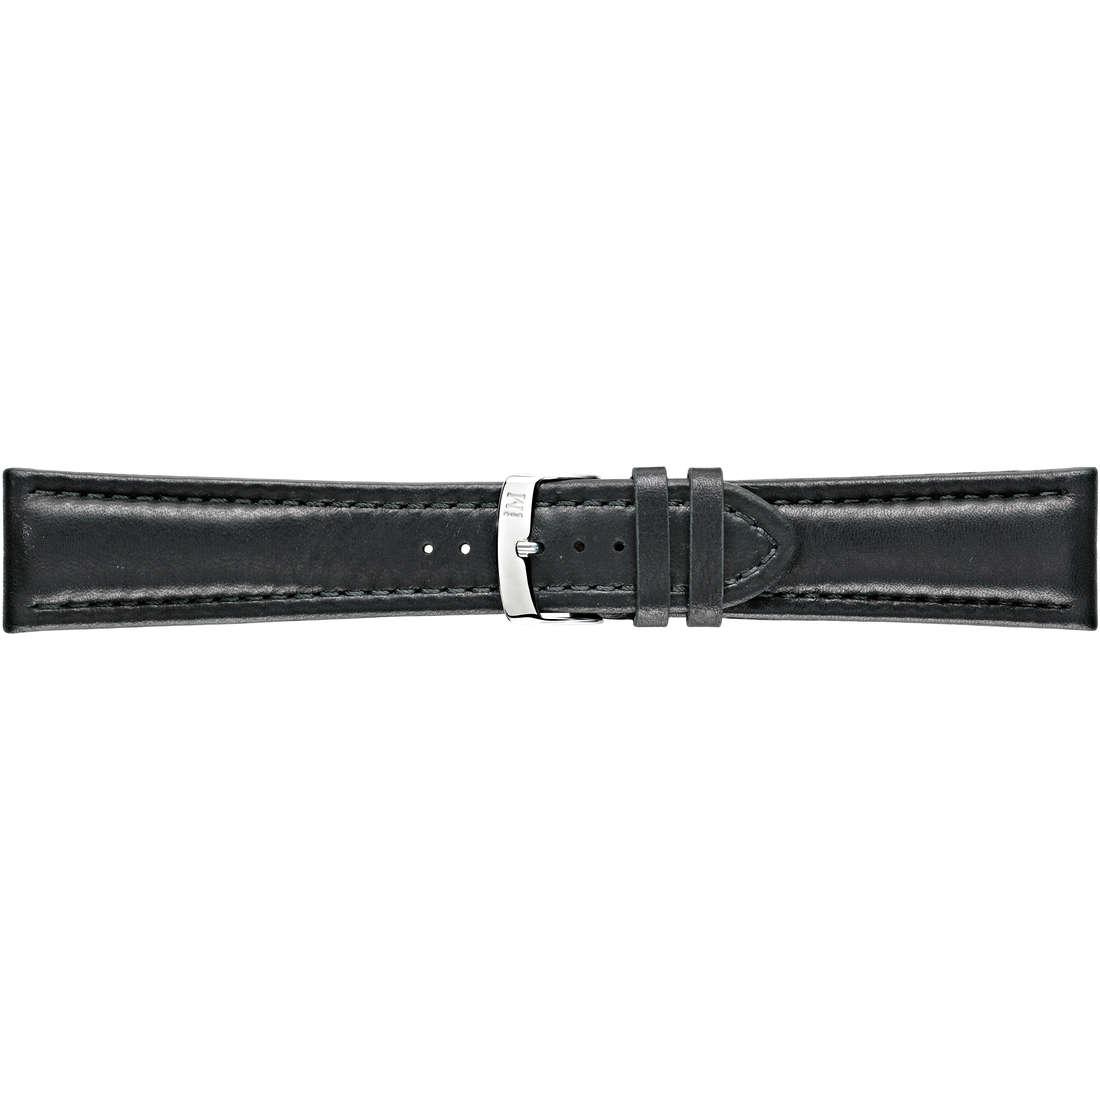 watch watch bands watch straps man Morellato Morellato 1930 A01U4026A37019CR28